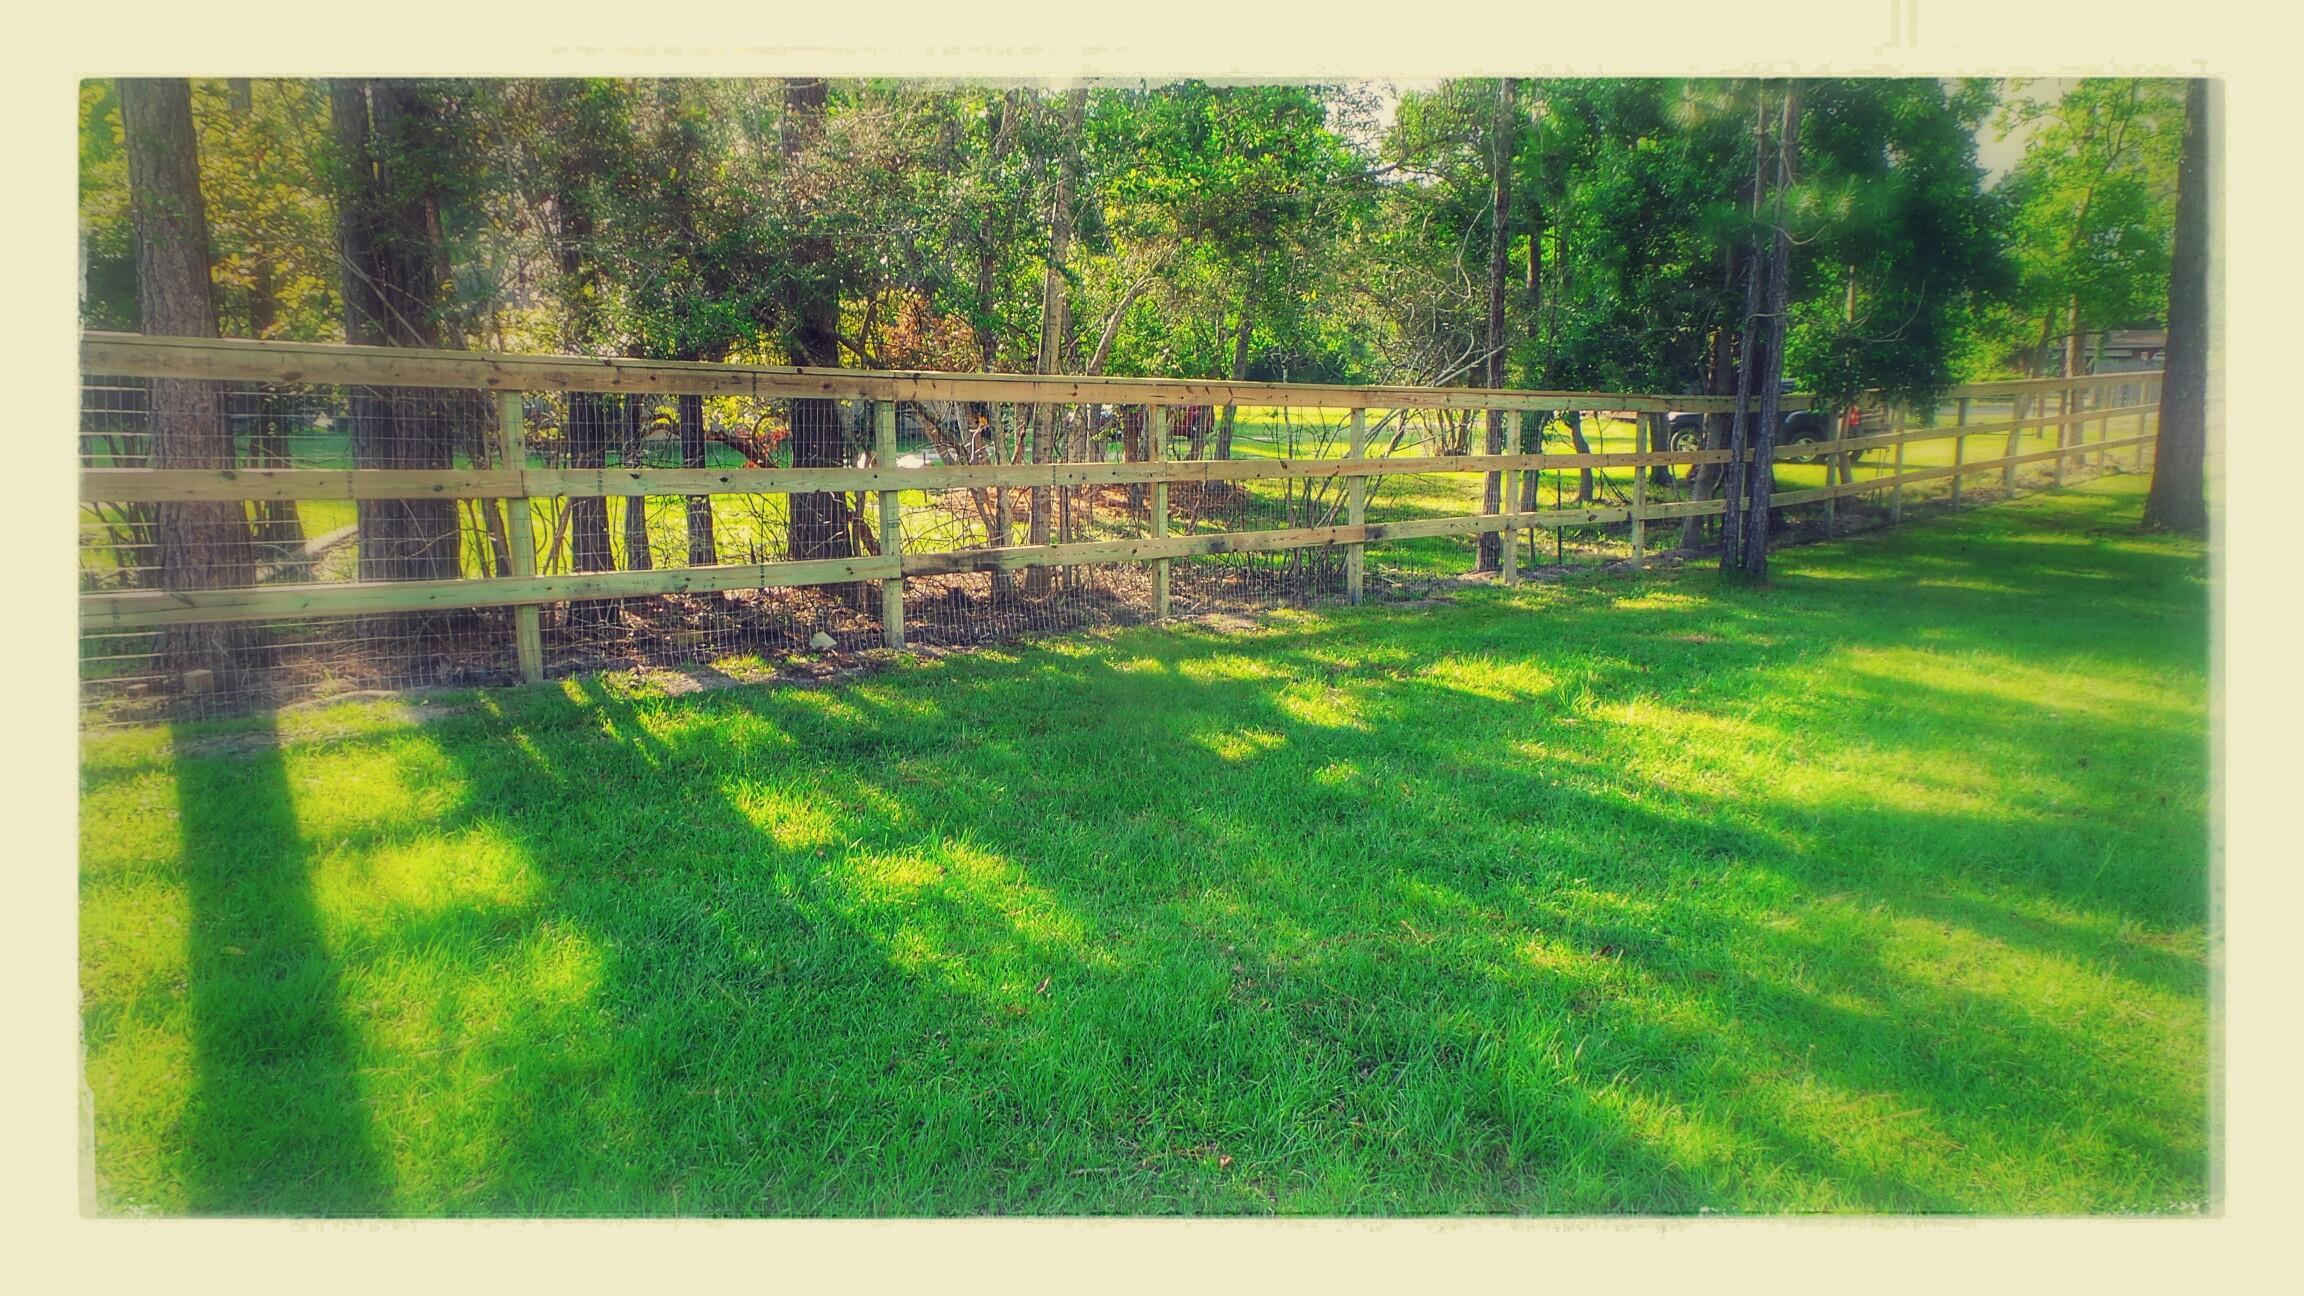 Fence Life Llc Navarre Fl 32566 Yp Com